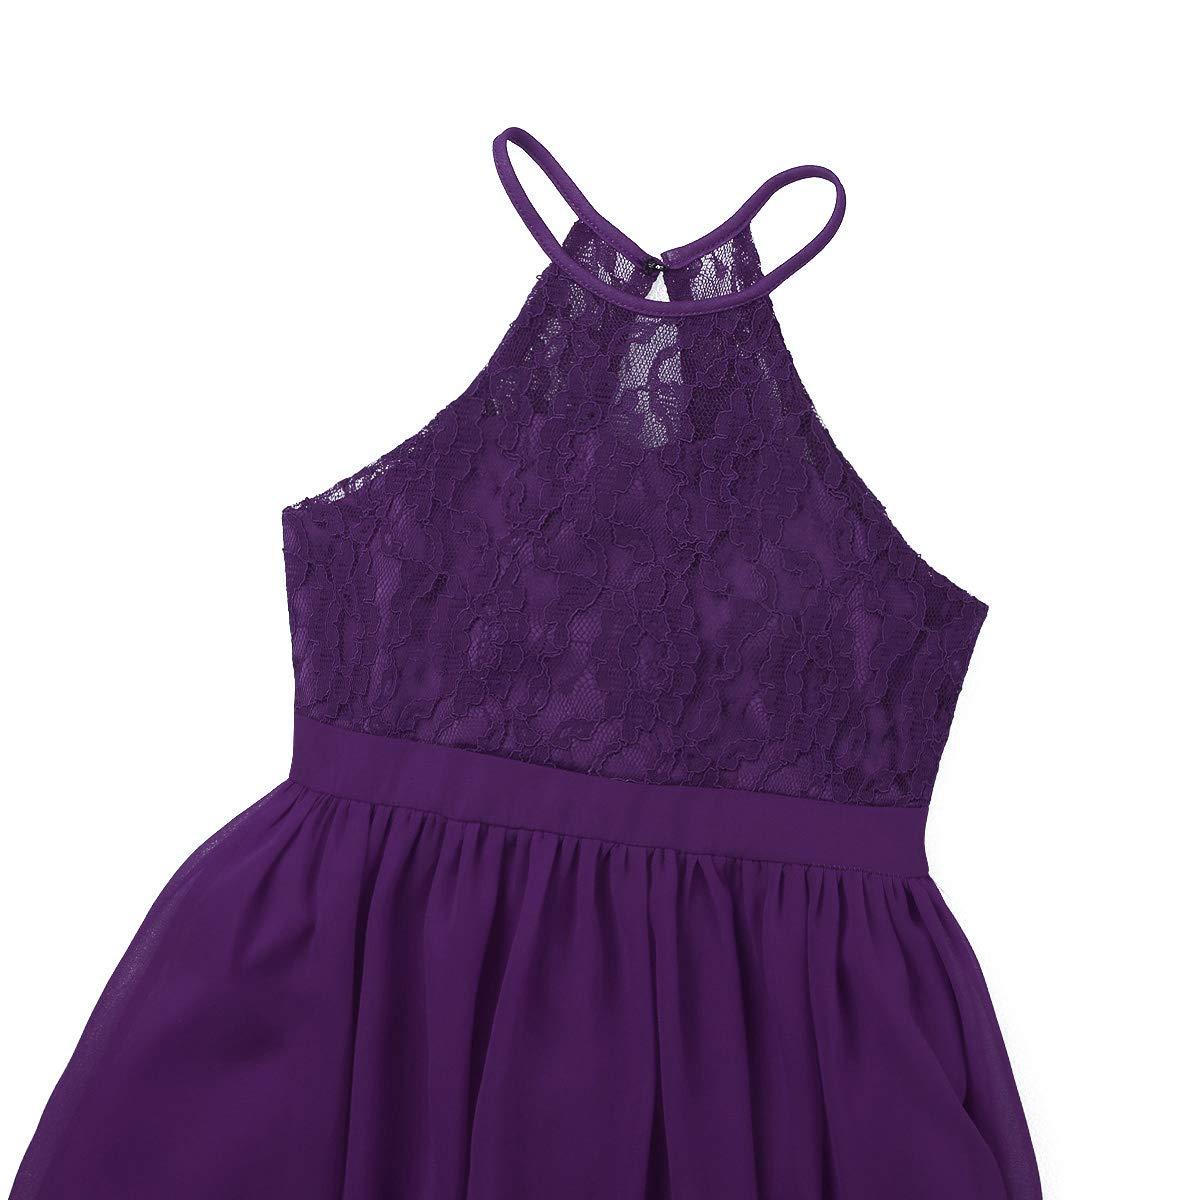 YiZYiF Kids Big Girls Halter Chiffon Lace Wedding Flower Girl Dresses Evening Prom Party Maxi Gown